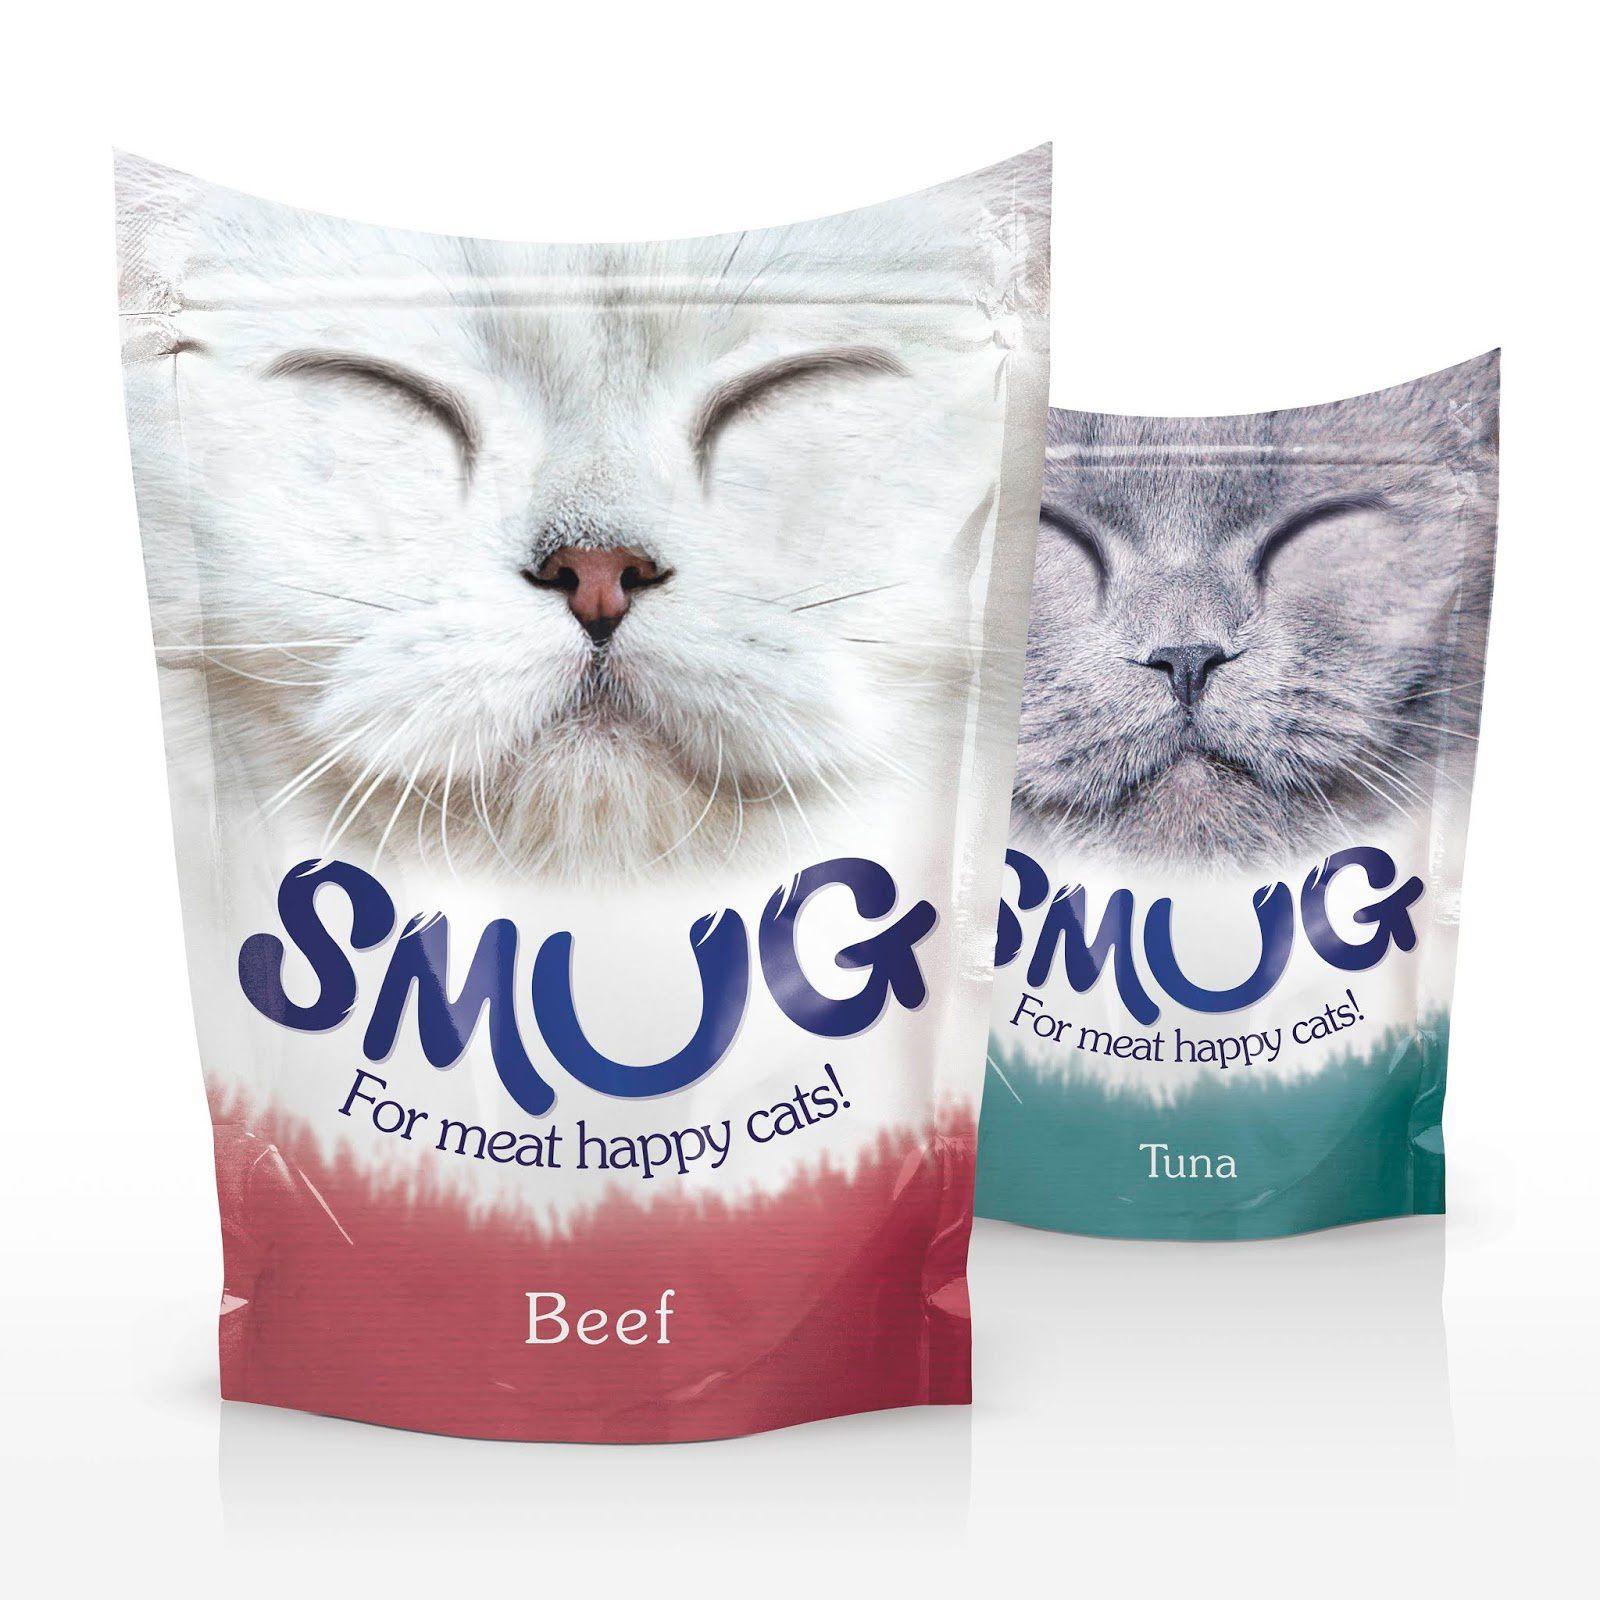 Smug (alimentation pour chats) I Design (concept) : Springetts Brand Design, Londres, Royaume-Uni (septembre 2018)